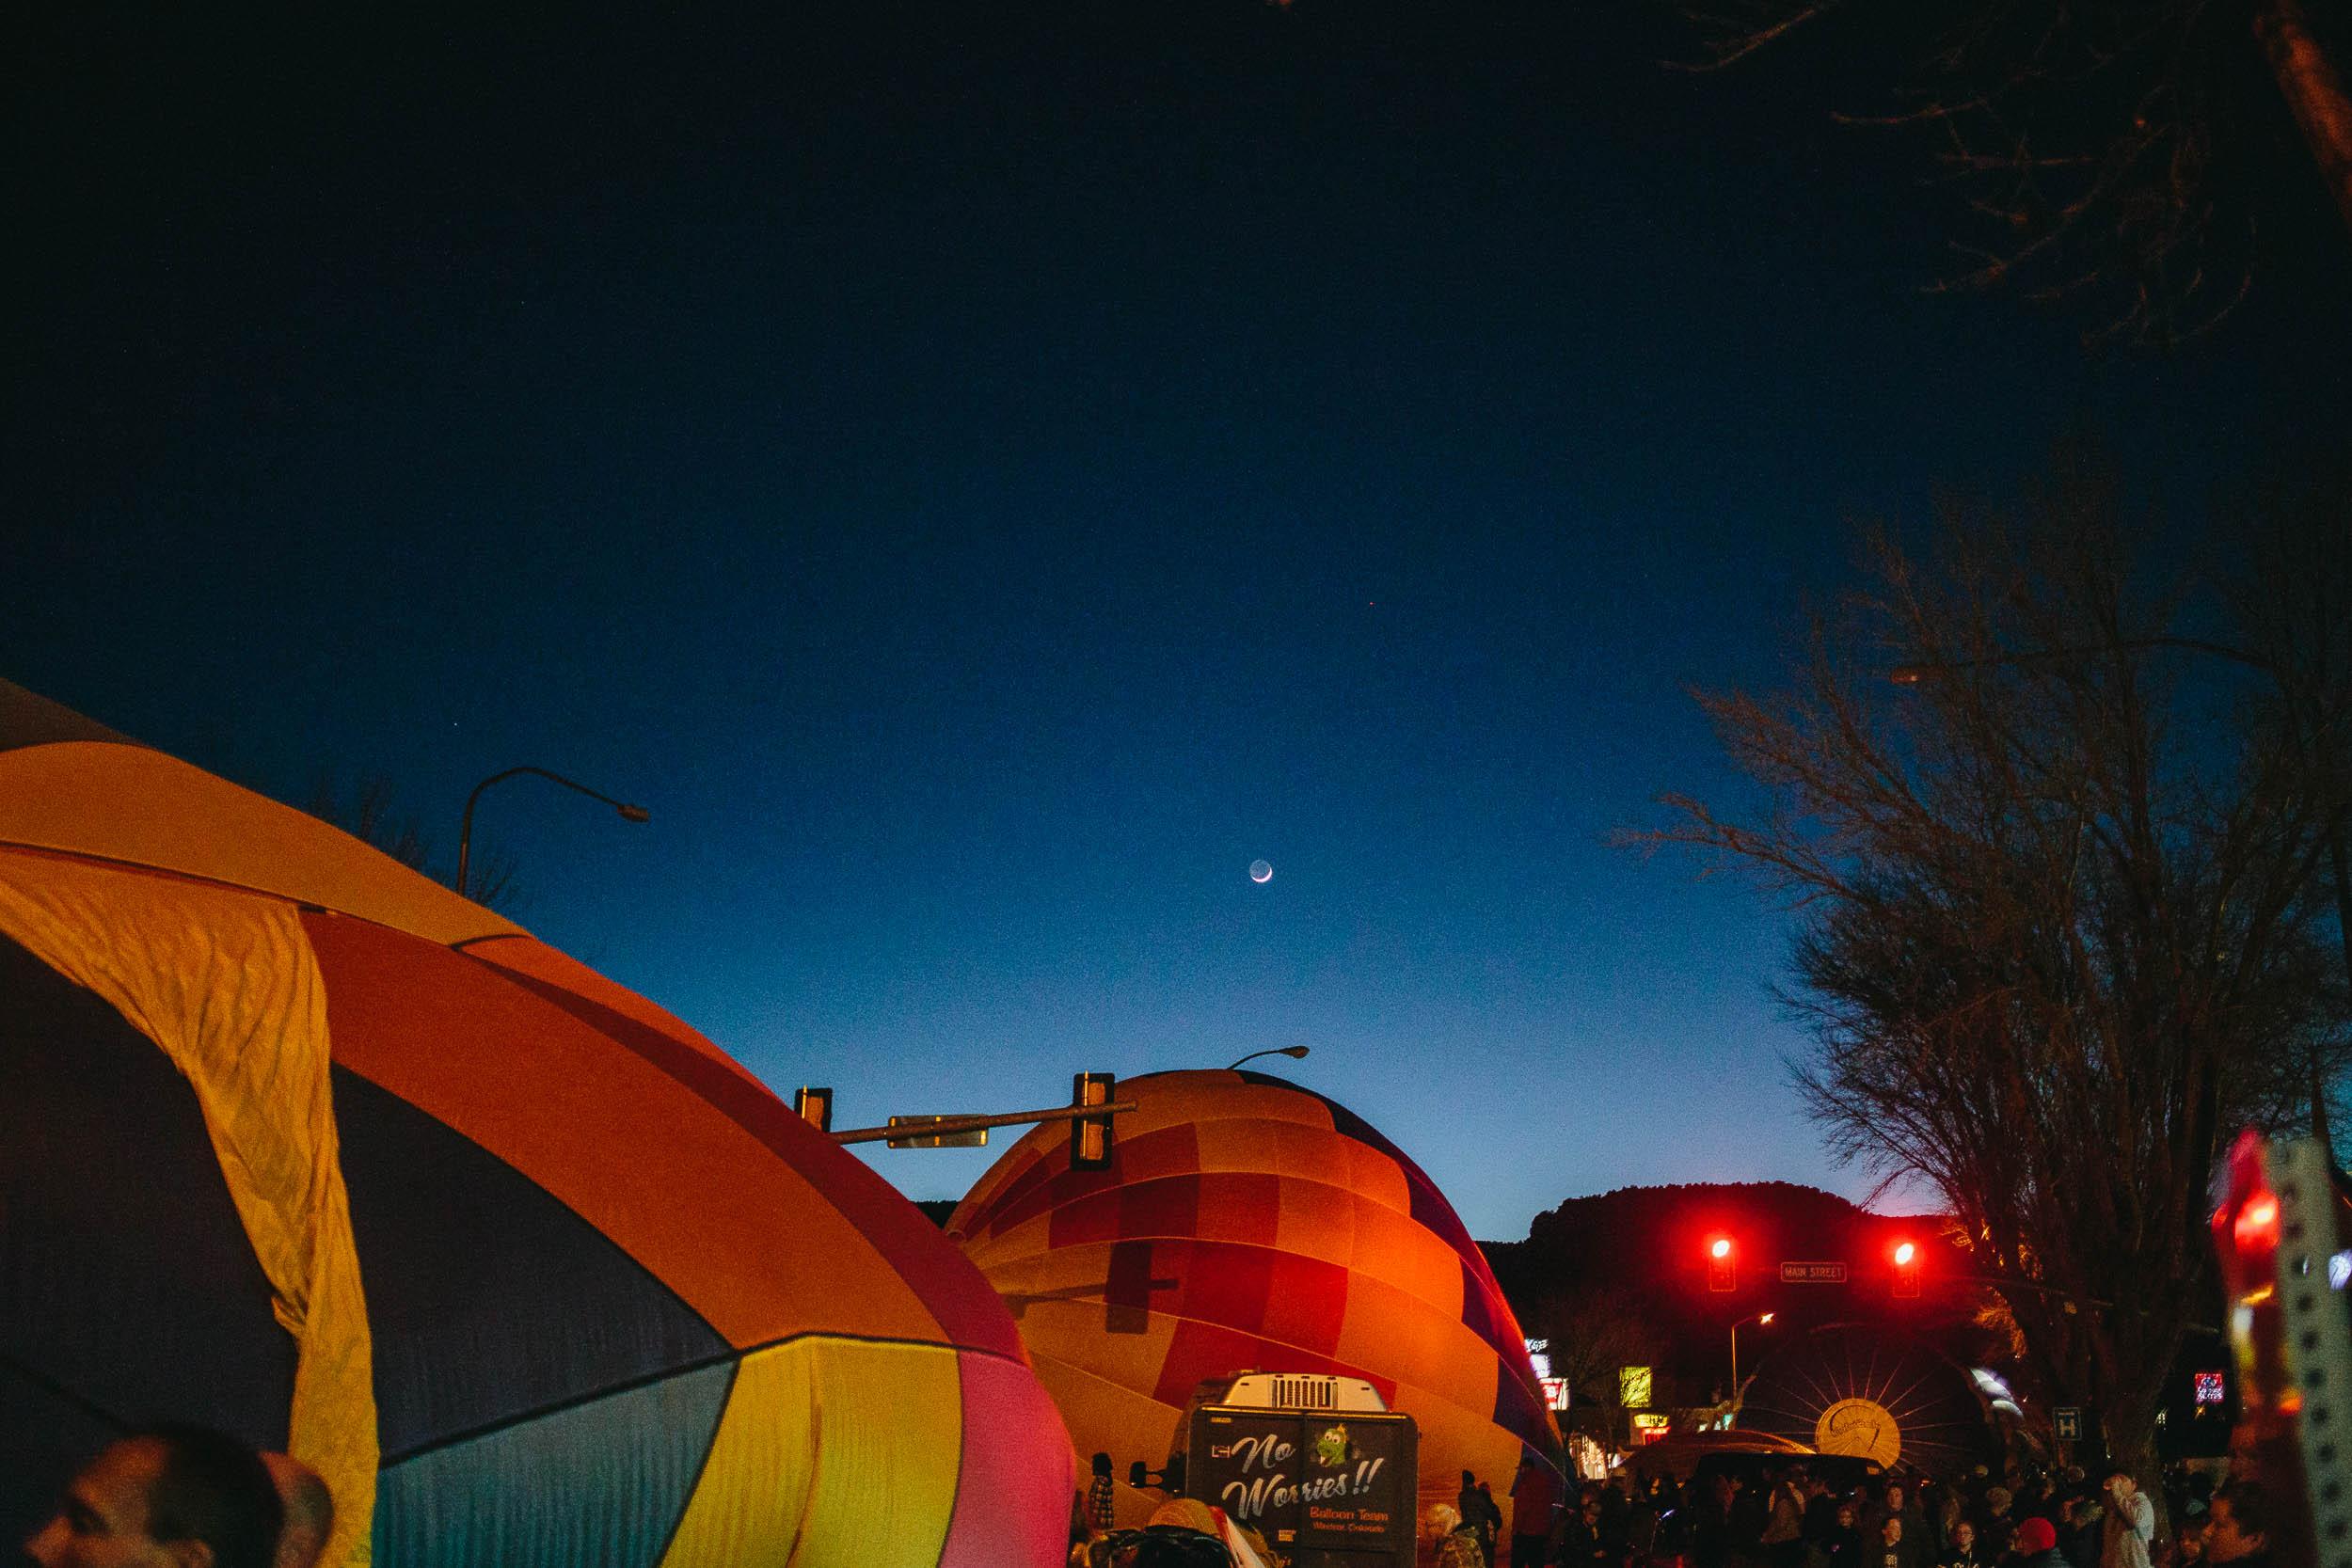 Kyle-Sheppard-Kanab-Balloon-Festival-43.jpg